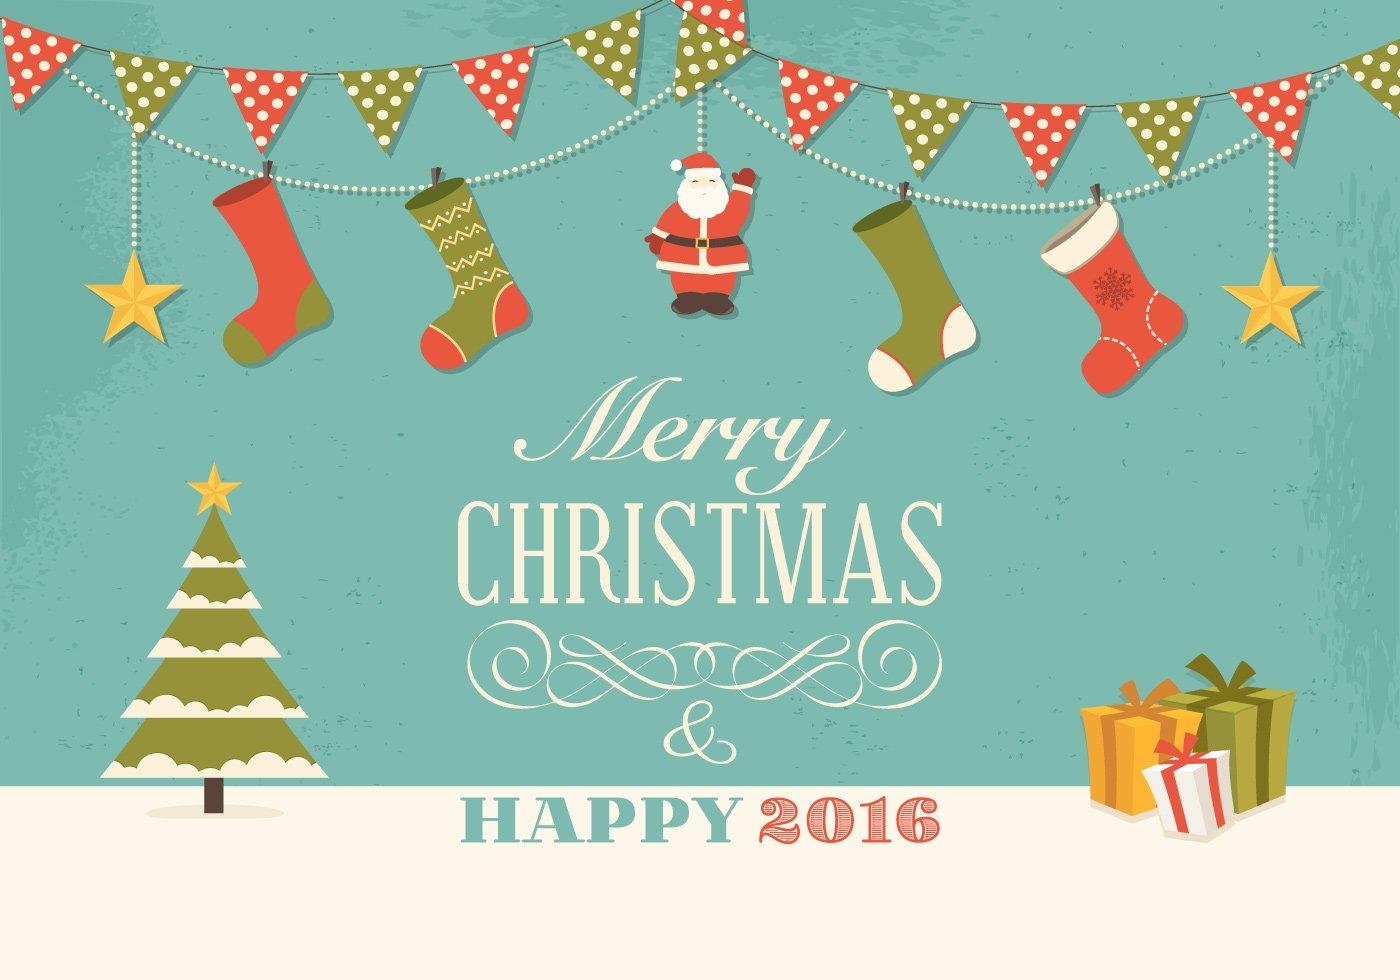 retro-christmas-wishes-card-1